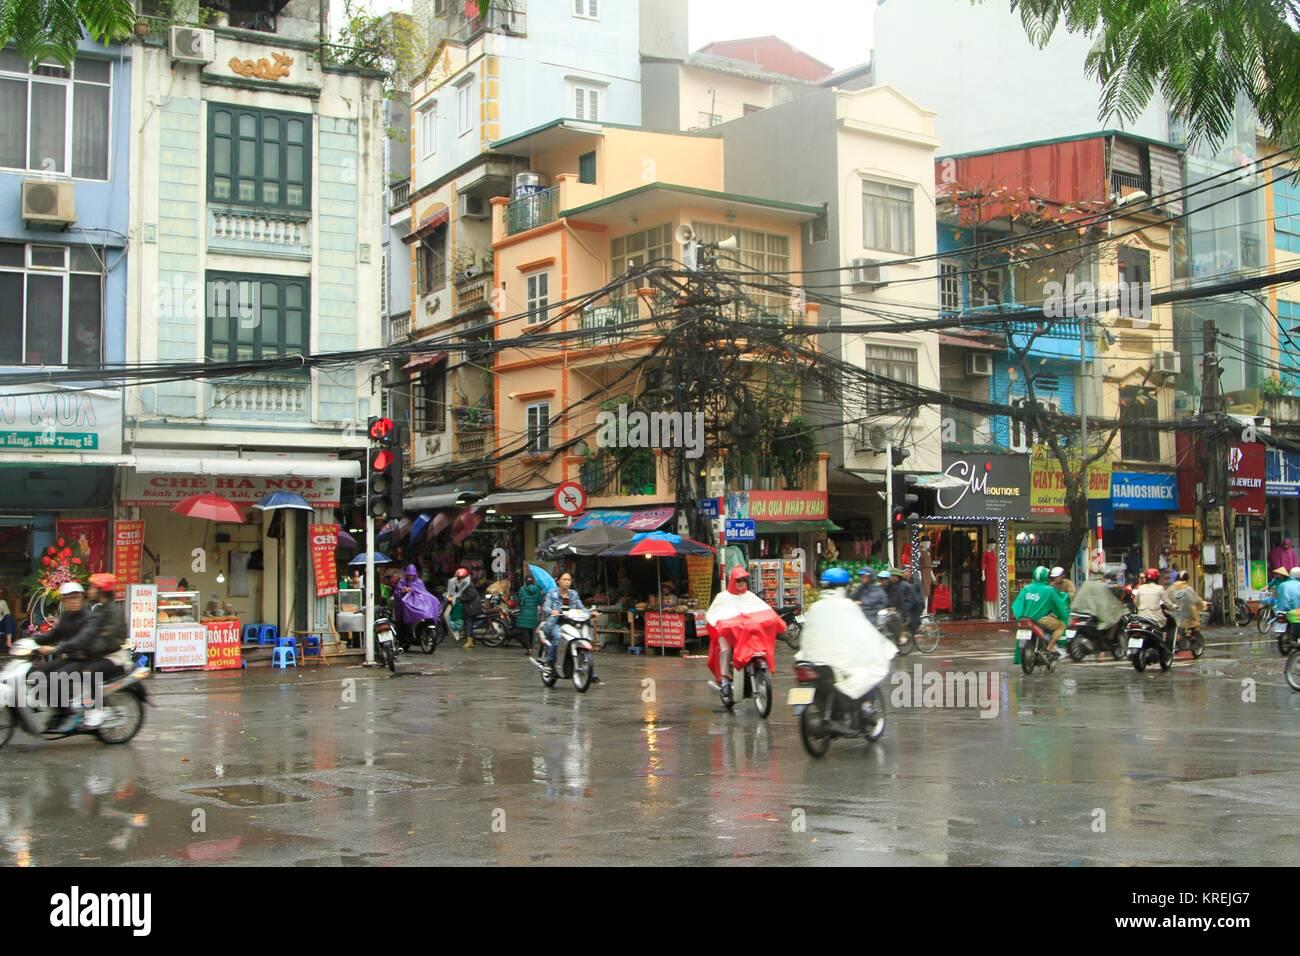 Rainy day street corner displaying the overhead Vietnamese electrical grid, Hanoi, Vietnam - Stock Image